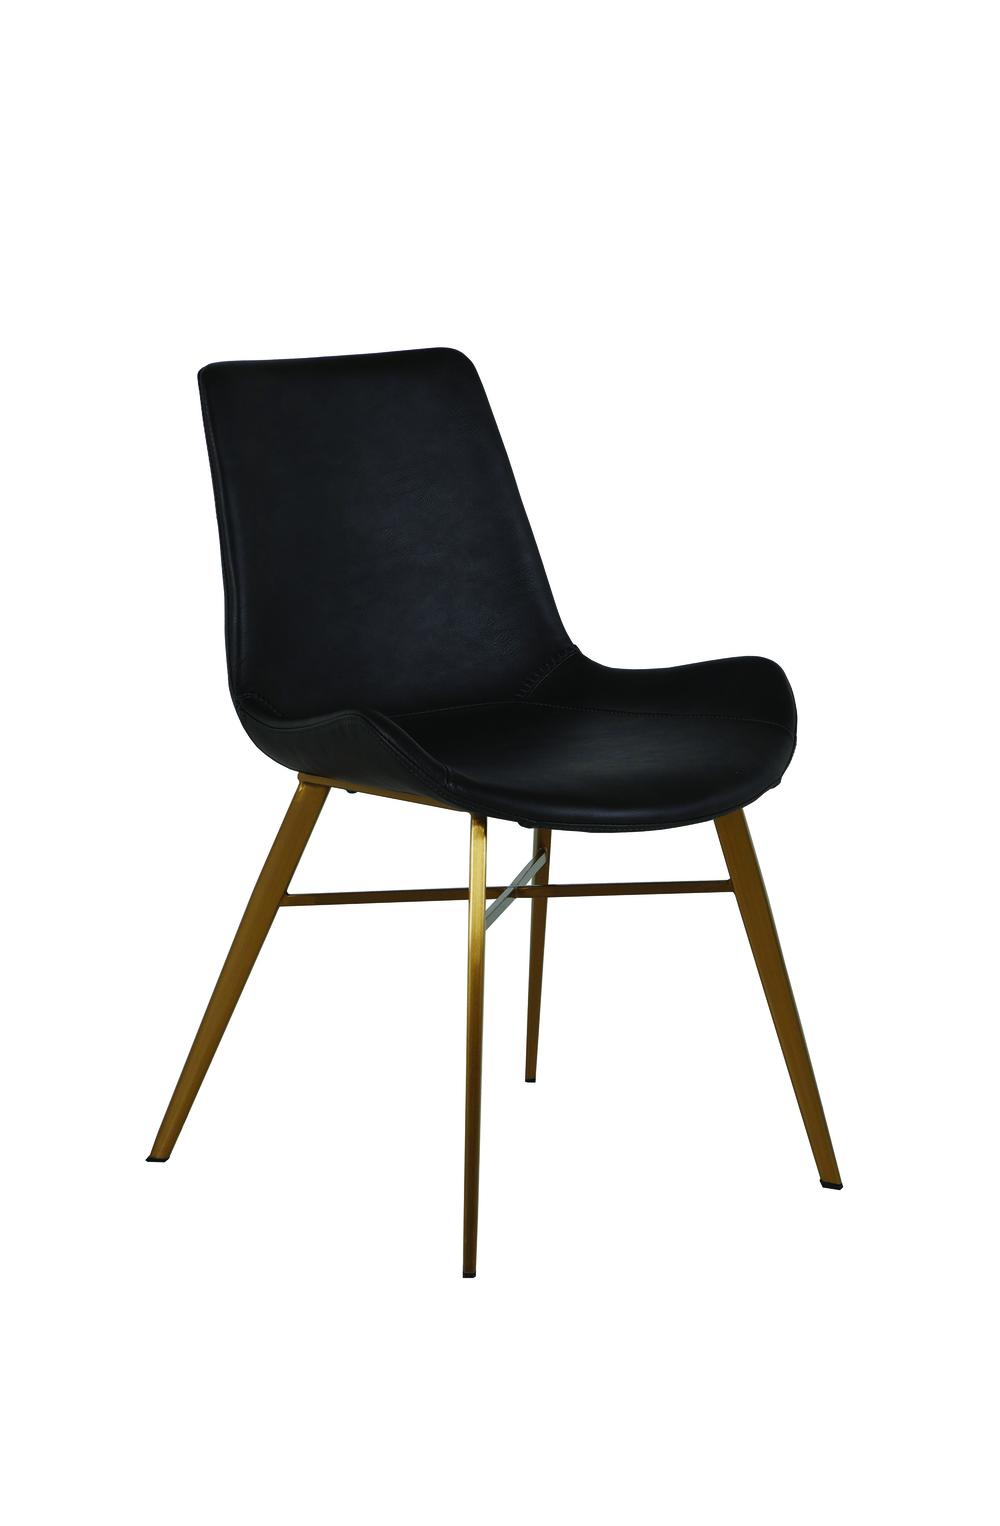 Gabby Home - Hines Dining Chair, 2/carton